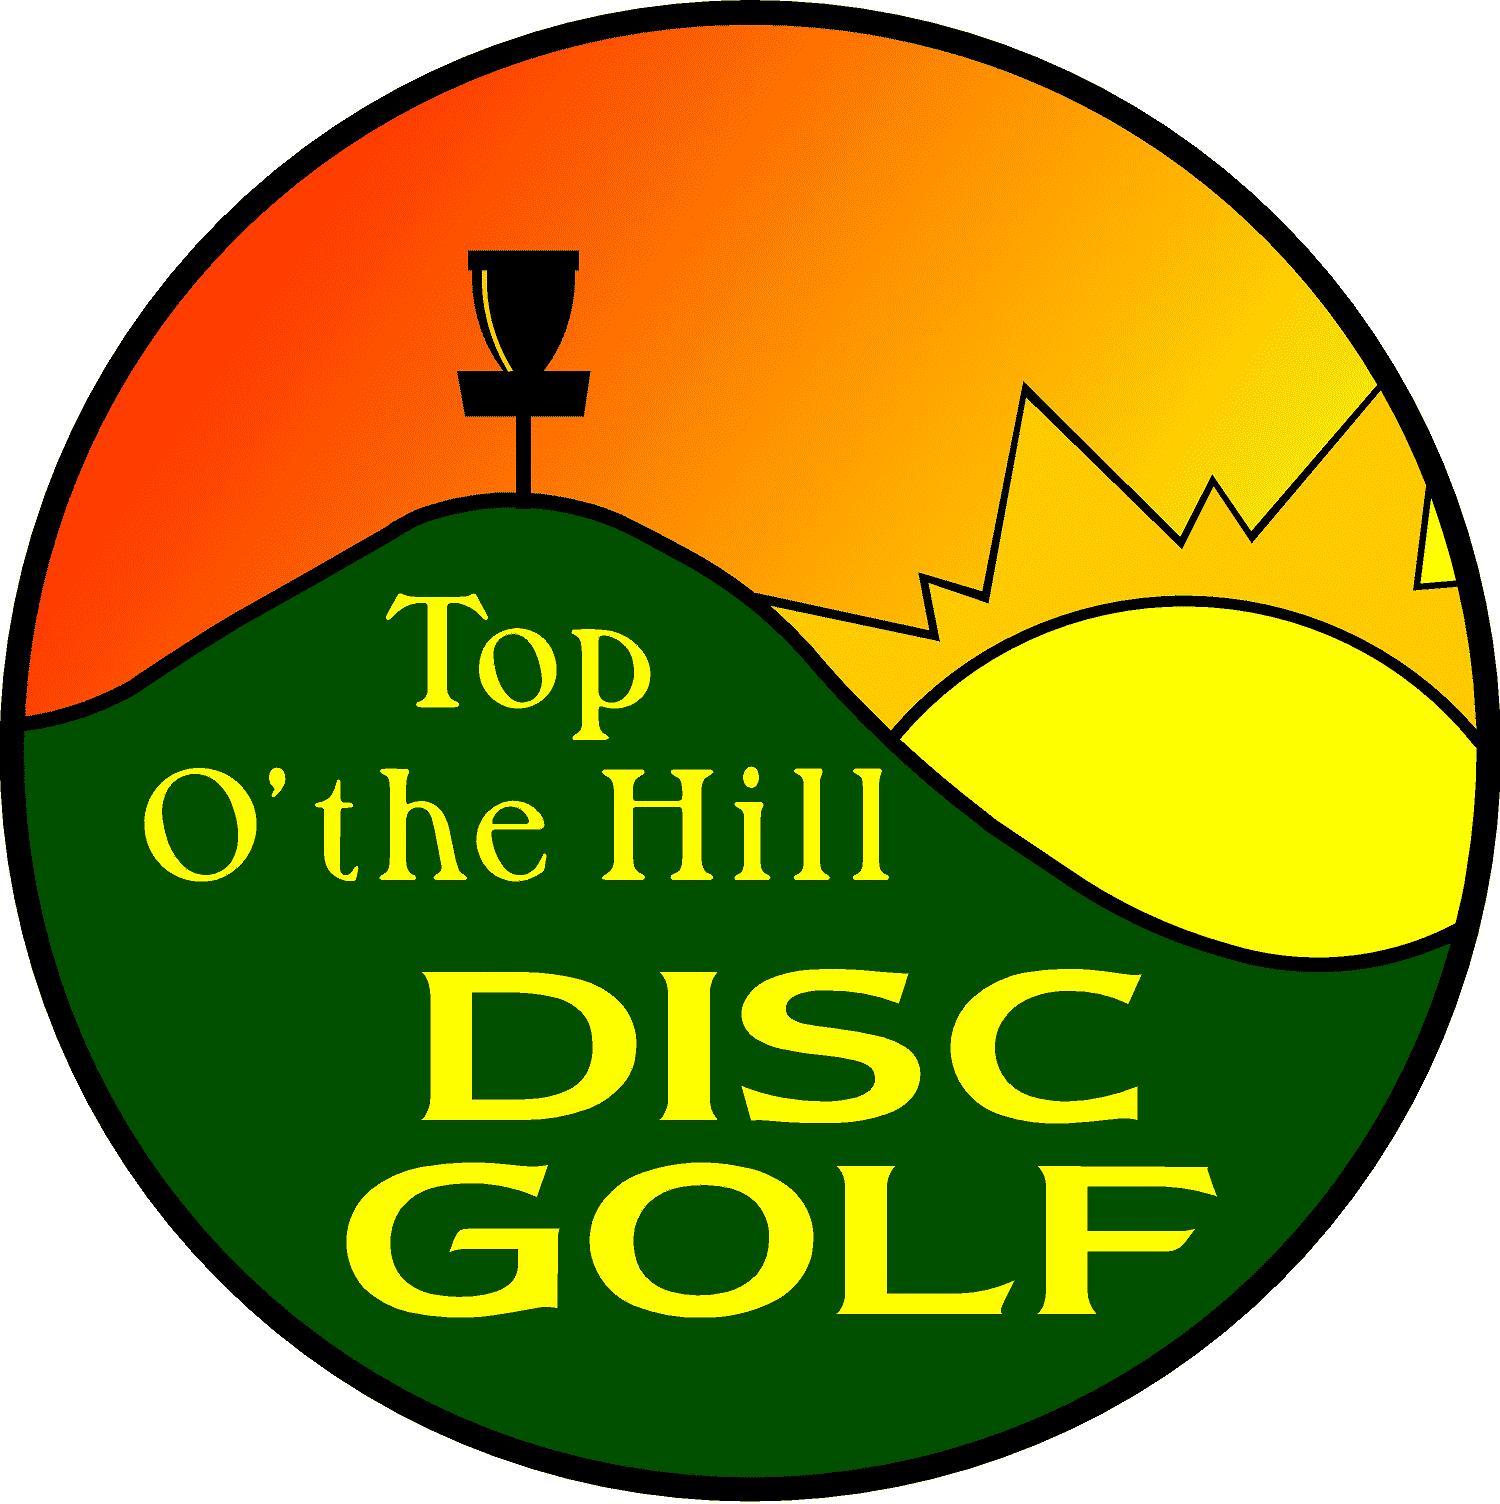 Top o the hill Disc golf course